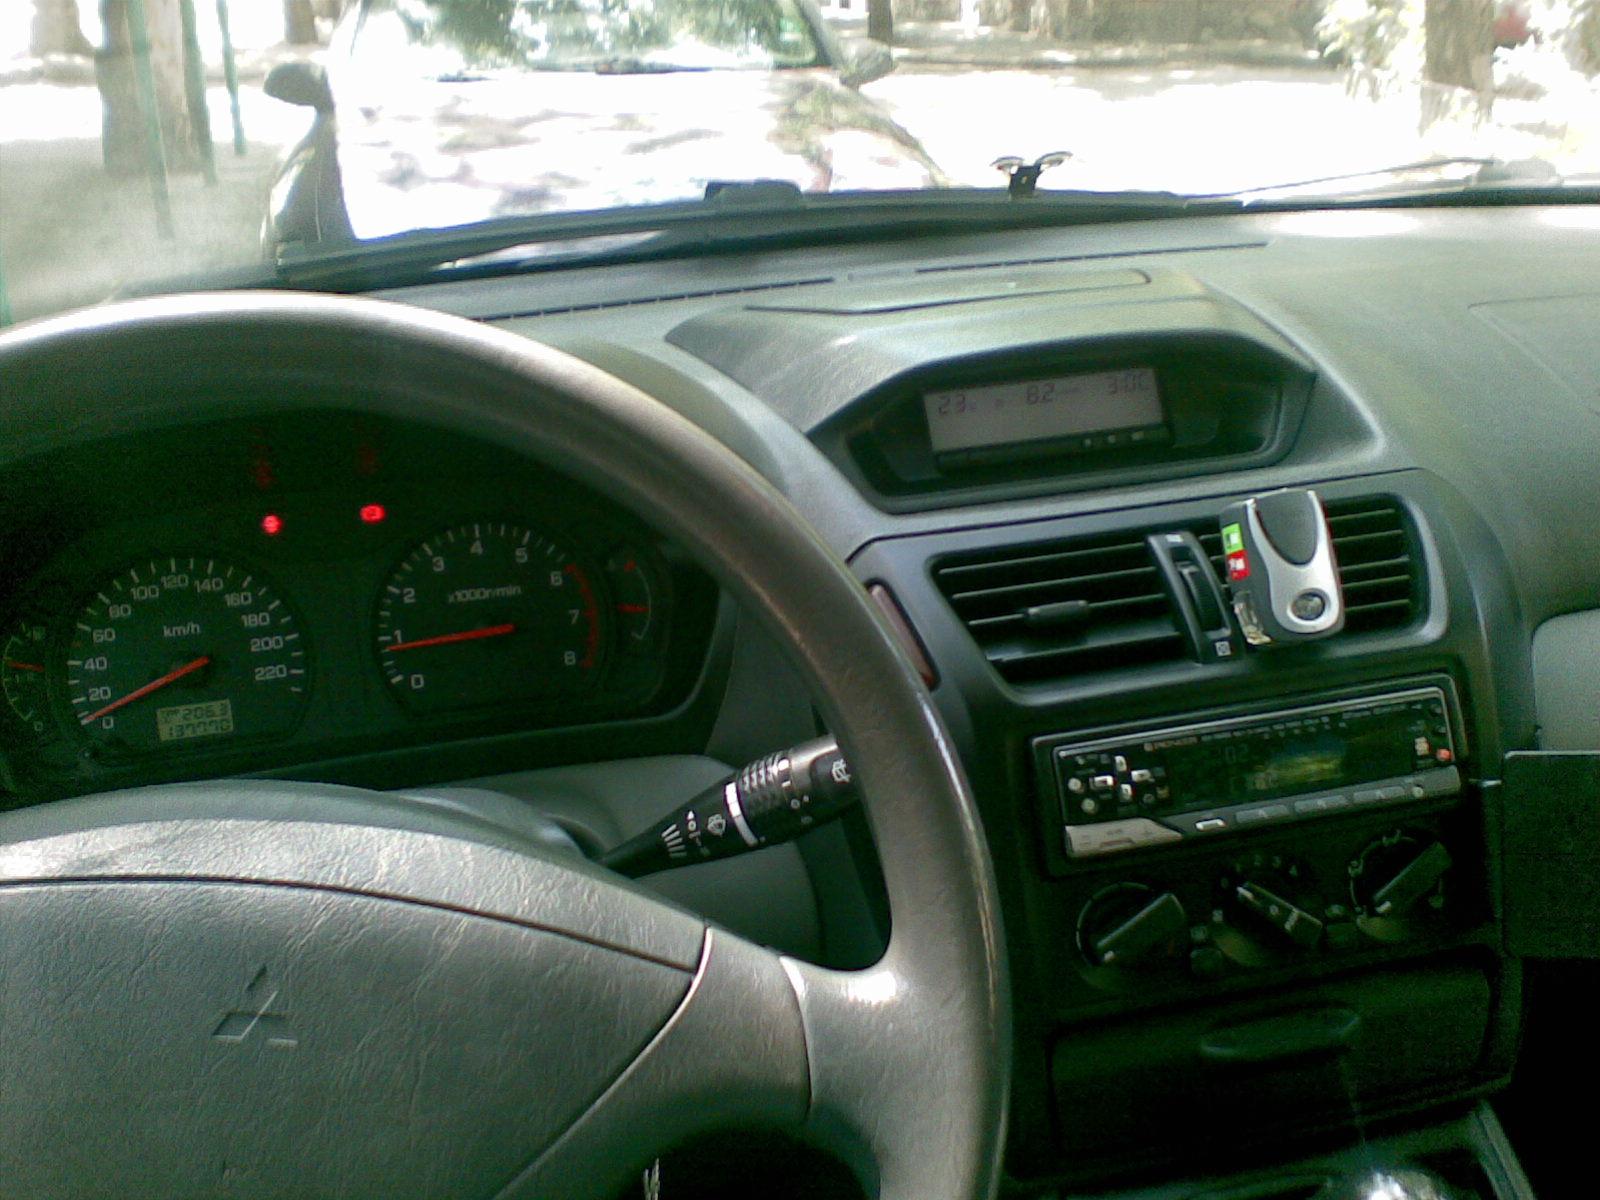 Nissan Micra 2017 Price In Pakistan >> 100+ [ Mitsubishi Minicab Interior ] | Car Picker Mitsubishi Lancer Cedia Interior Images ...